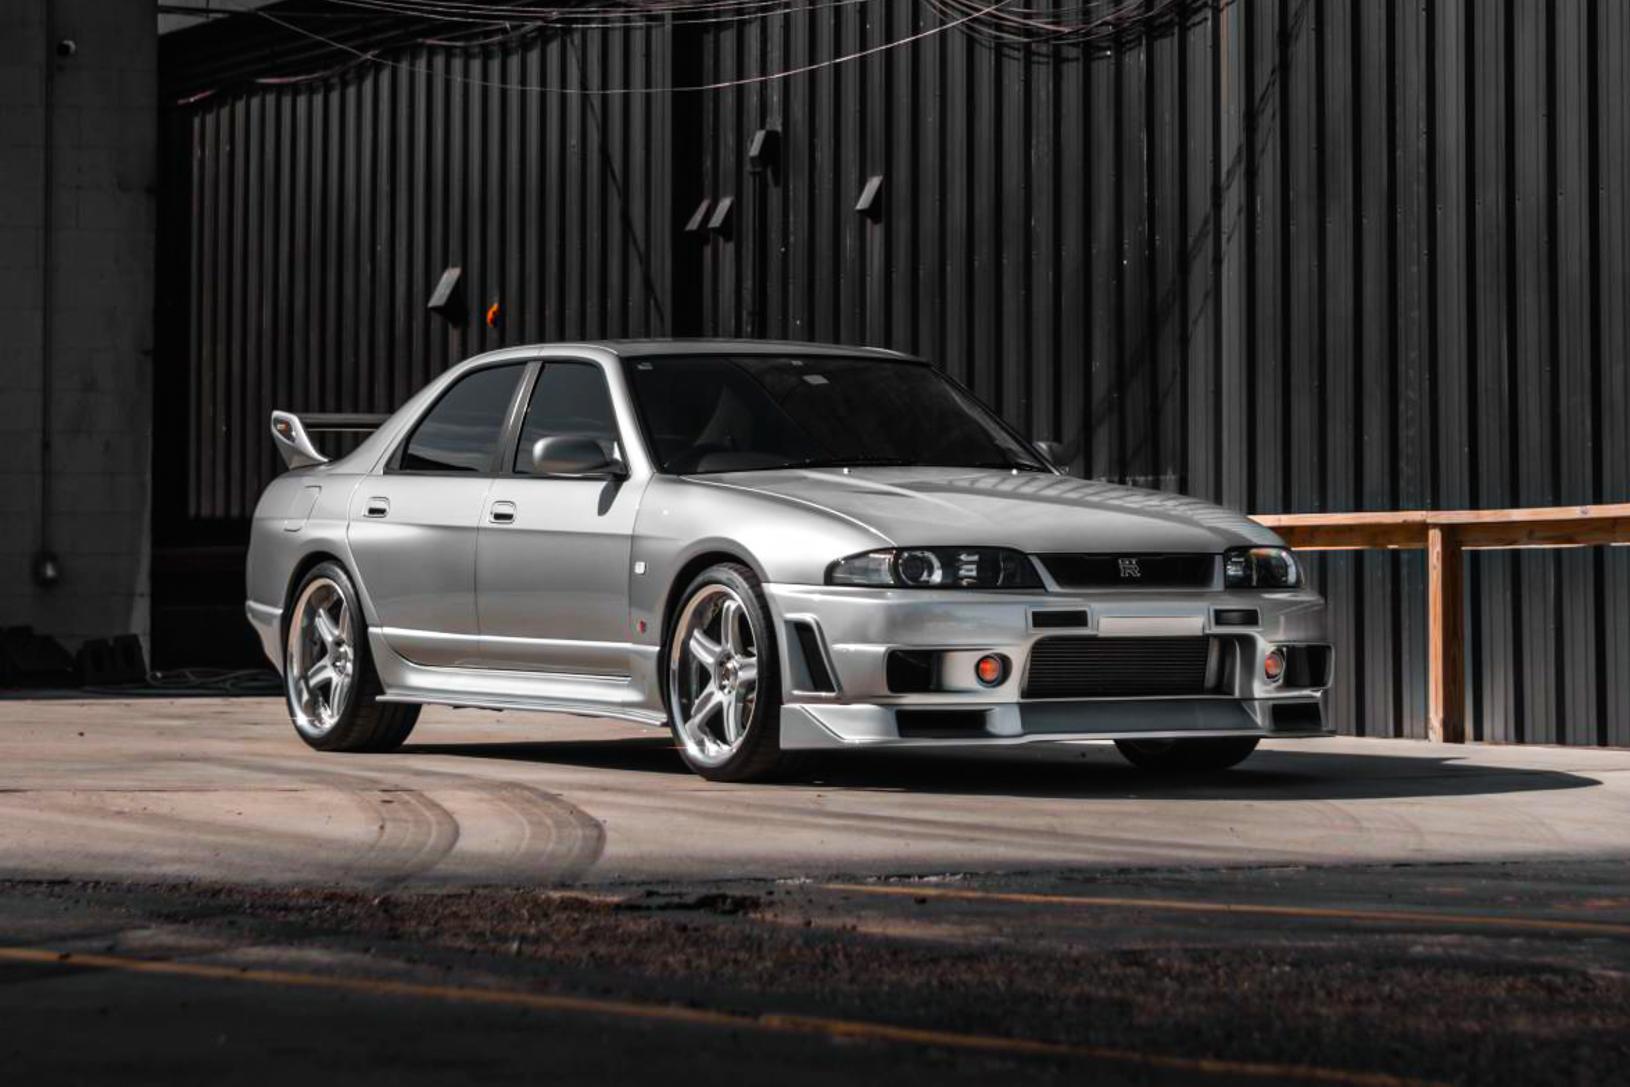 1998 Nissan Skyline GT-R 'Autech'